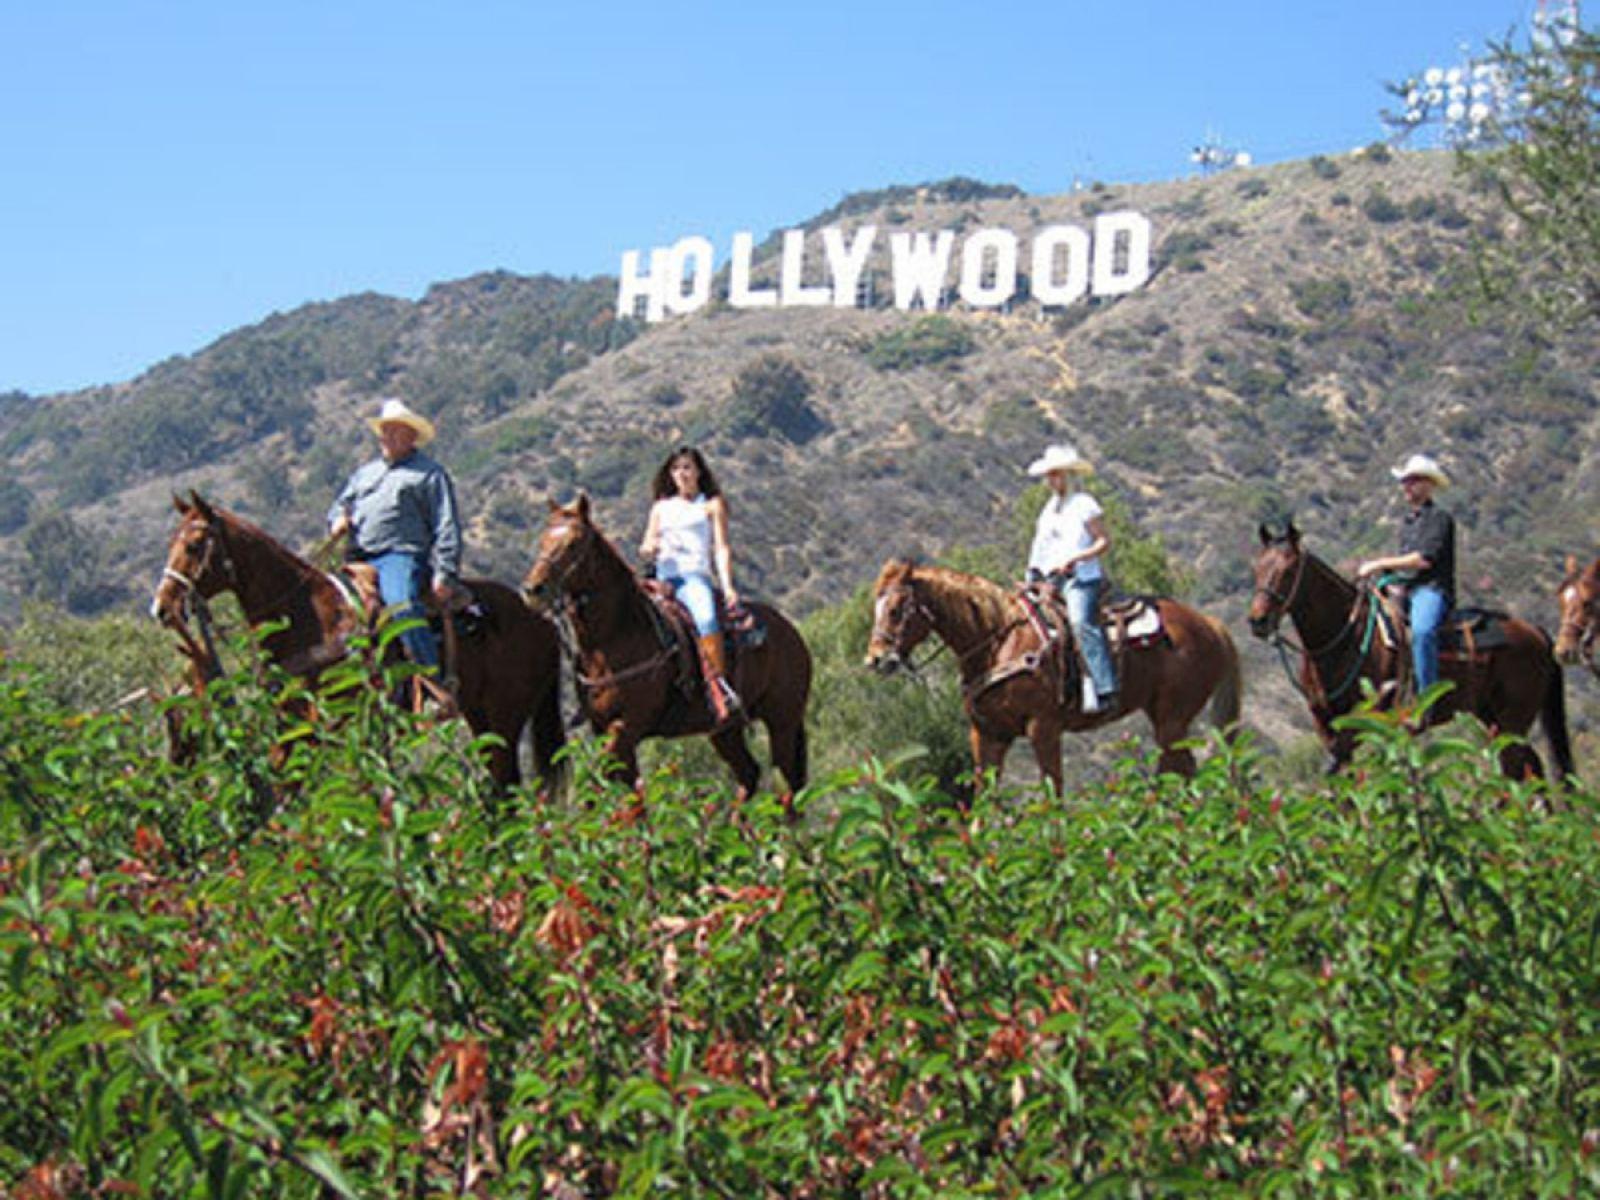 Main image for article titled LAツアー:ロサンゼルスを満喫するためのベストツアー特集 (後半)